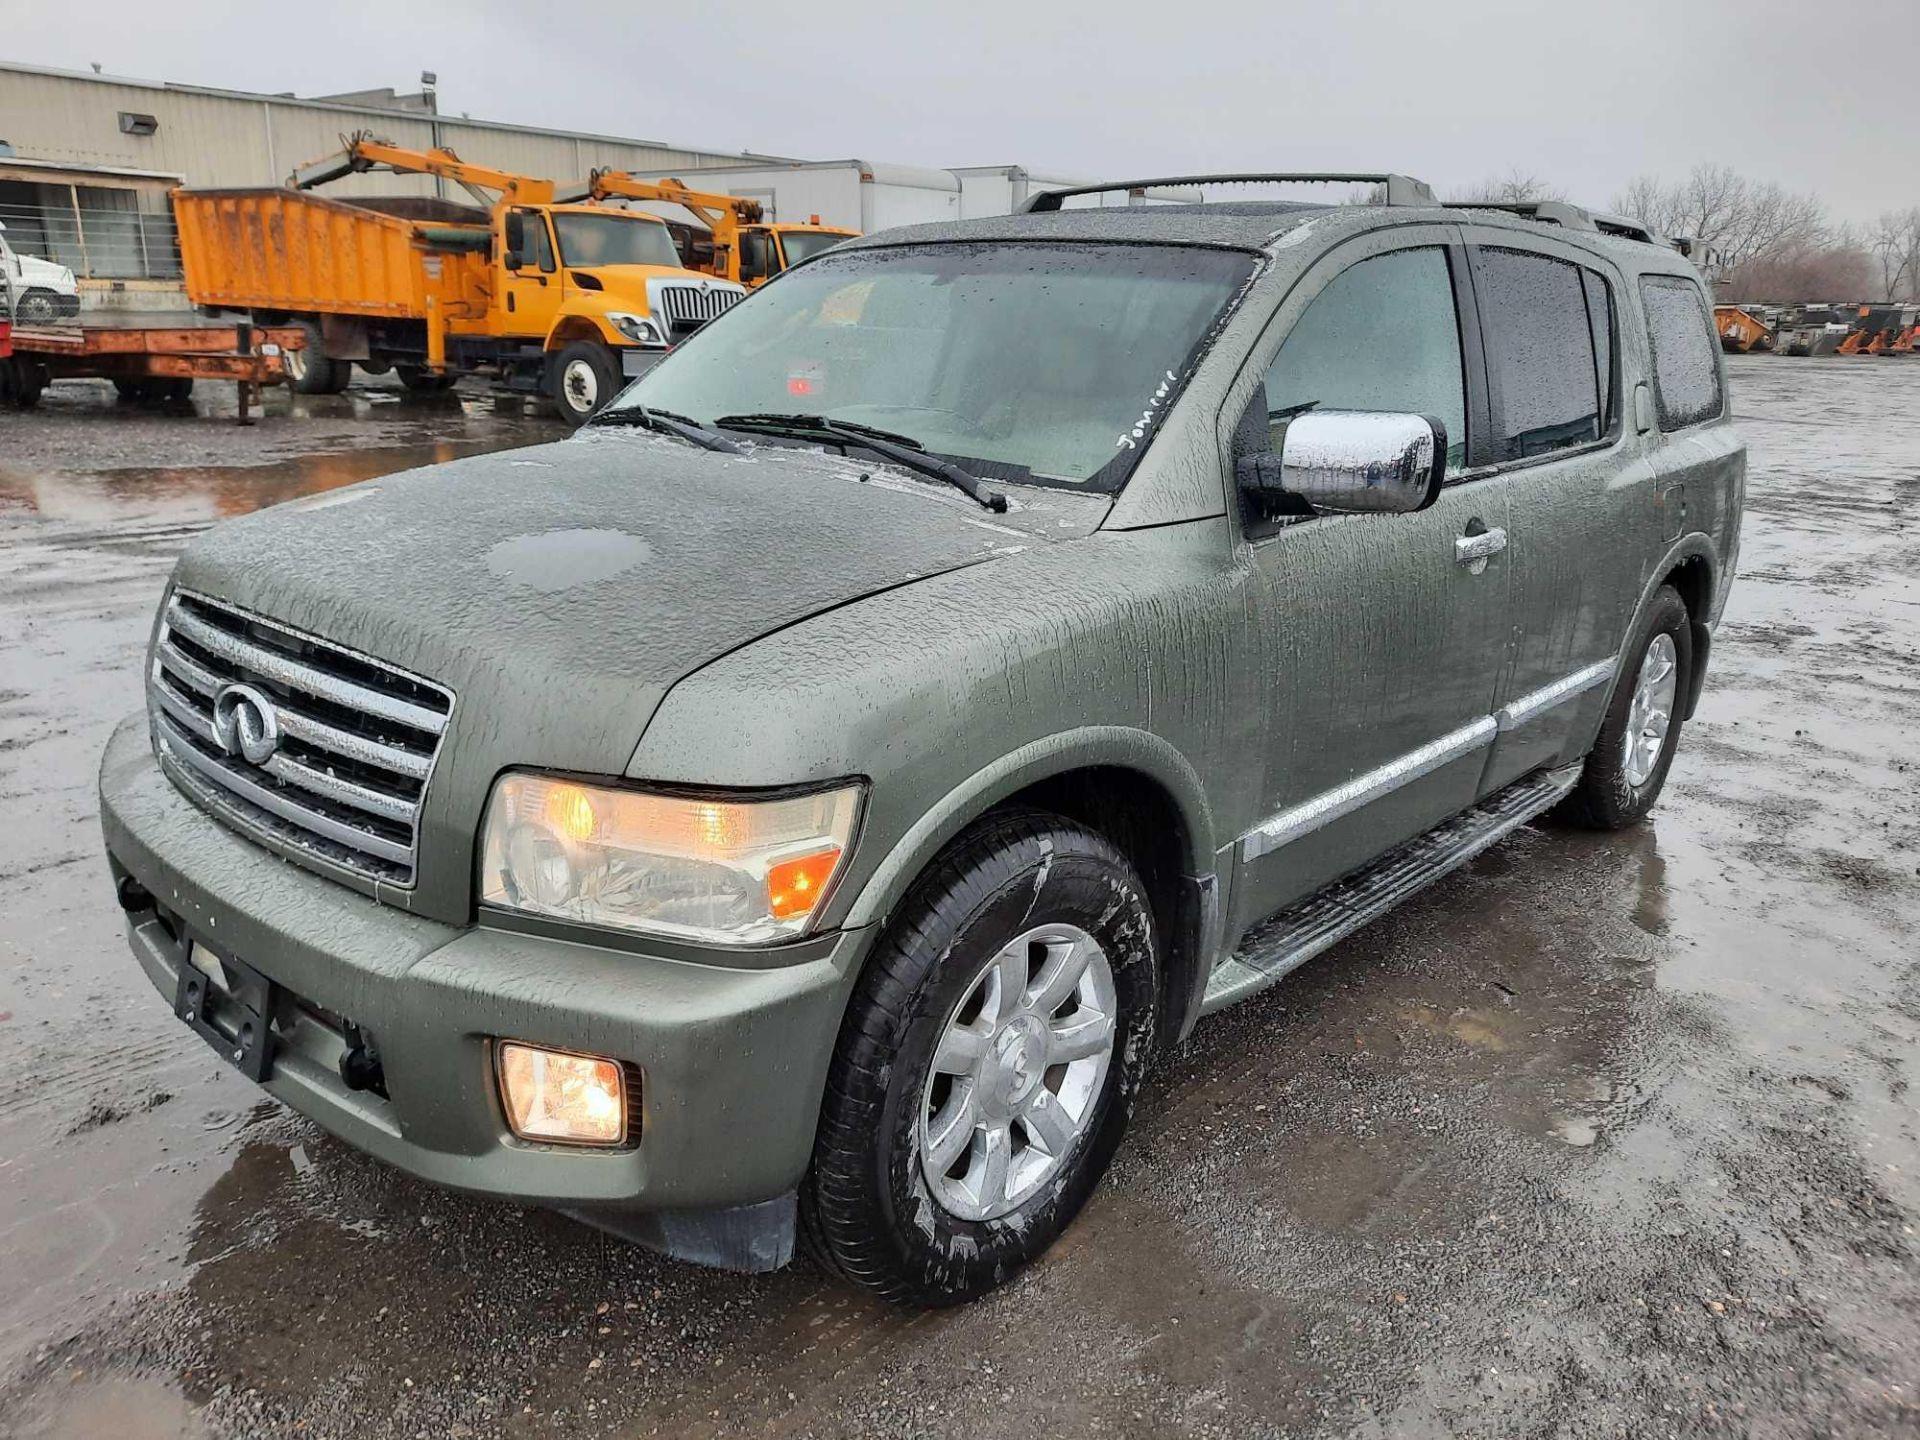 2004 INFINITI QX56 4X4 SUV